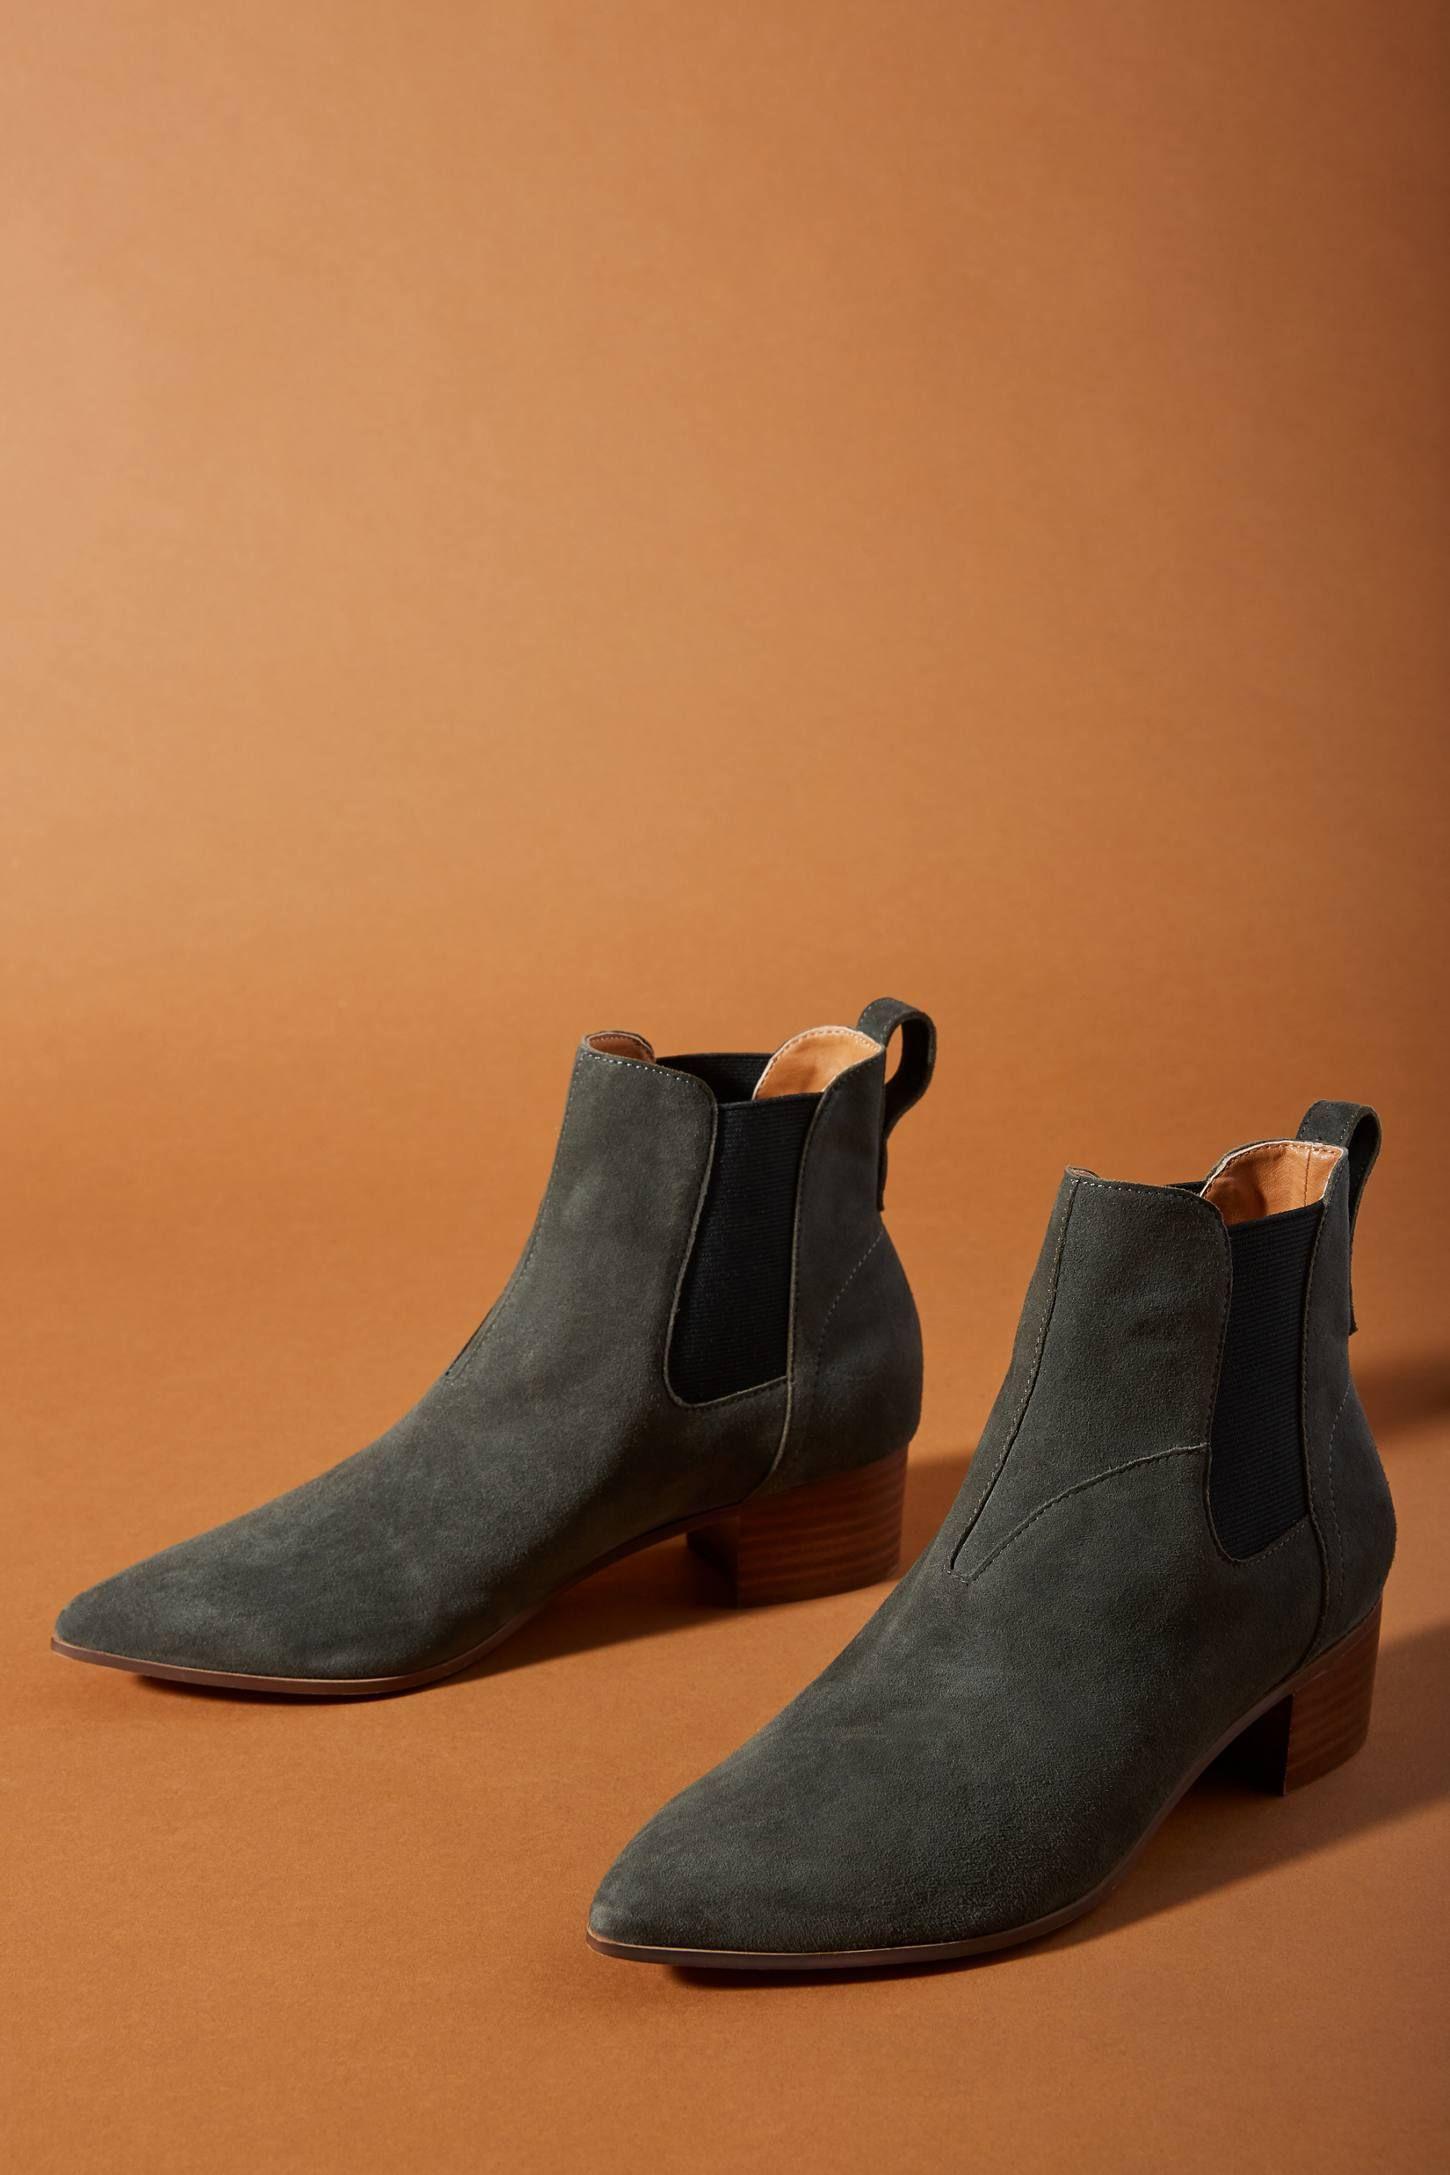 Delize Brown Chelsea boot - Buy Delize Brown Chelsea boot